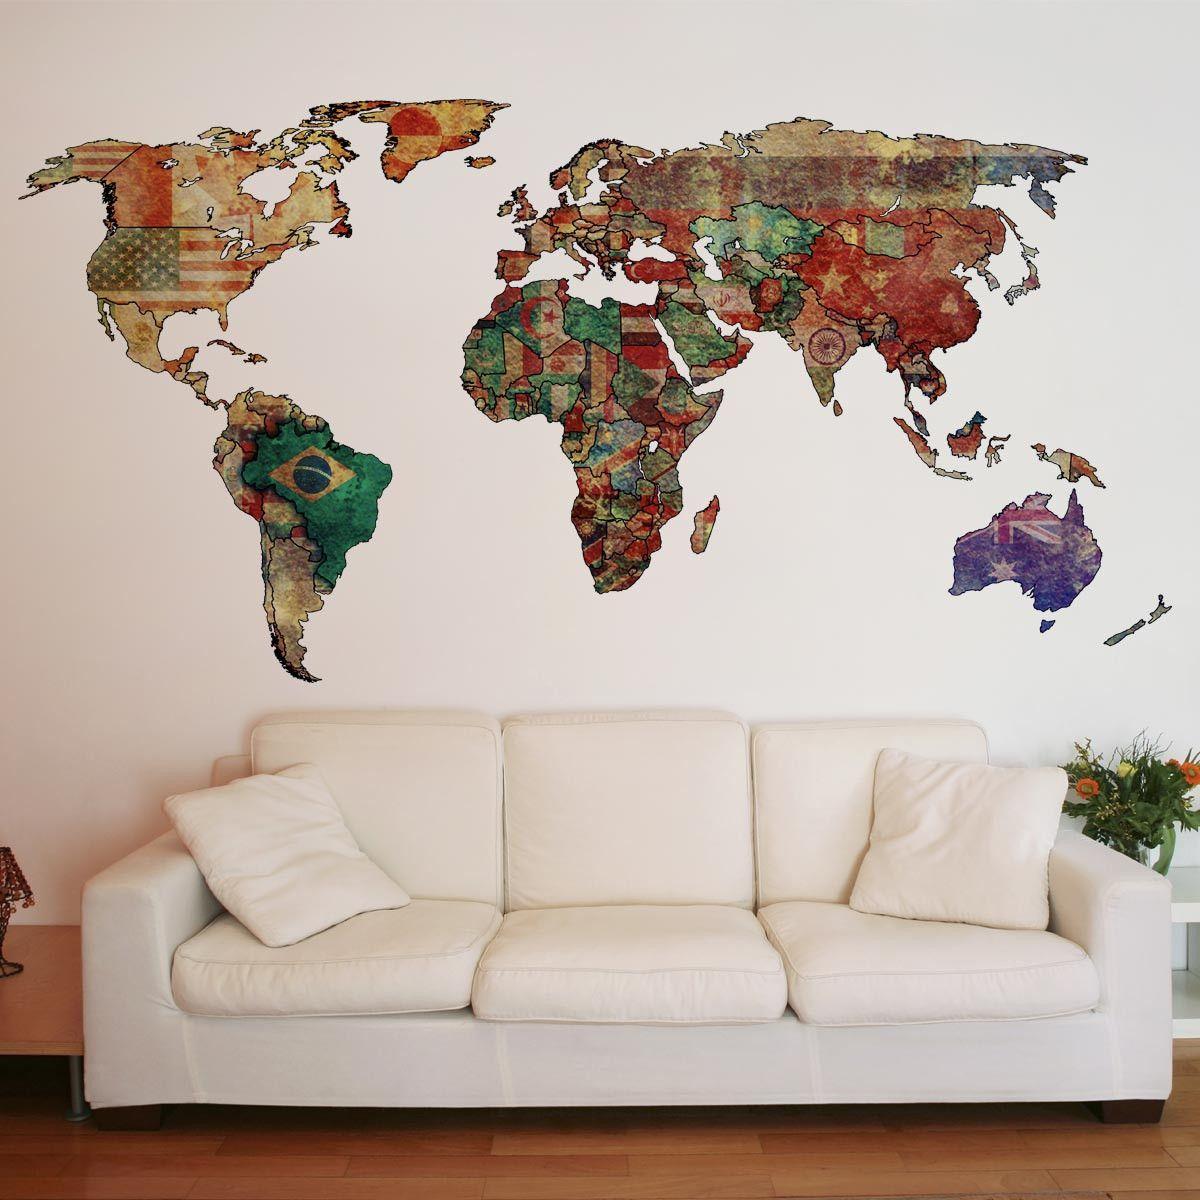 Adesivo de Parede Mapa Mundi | igreja | Pinterest